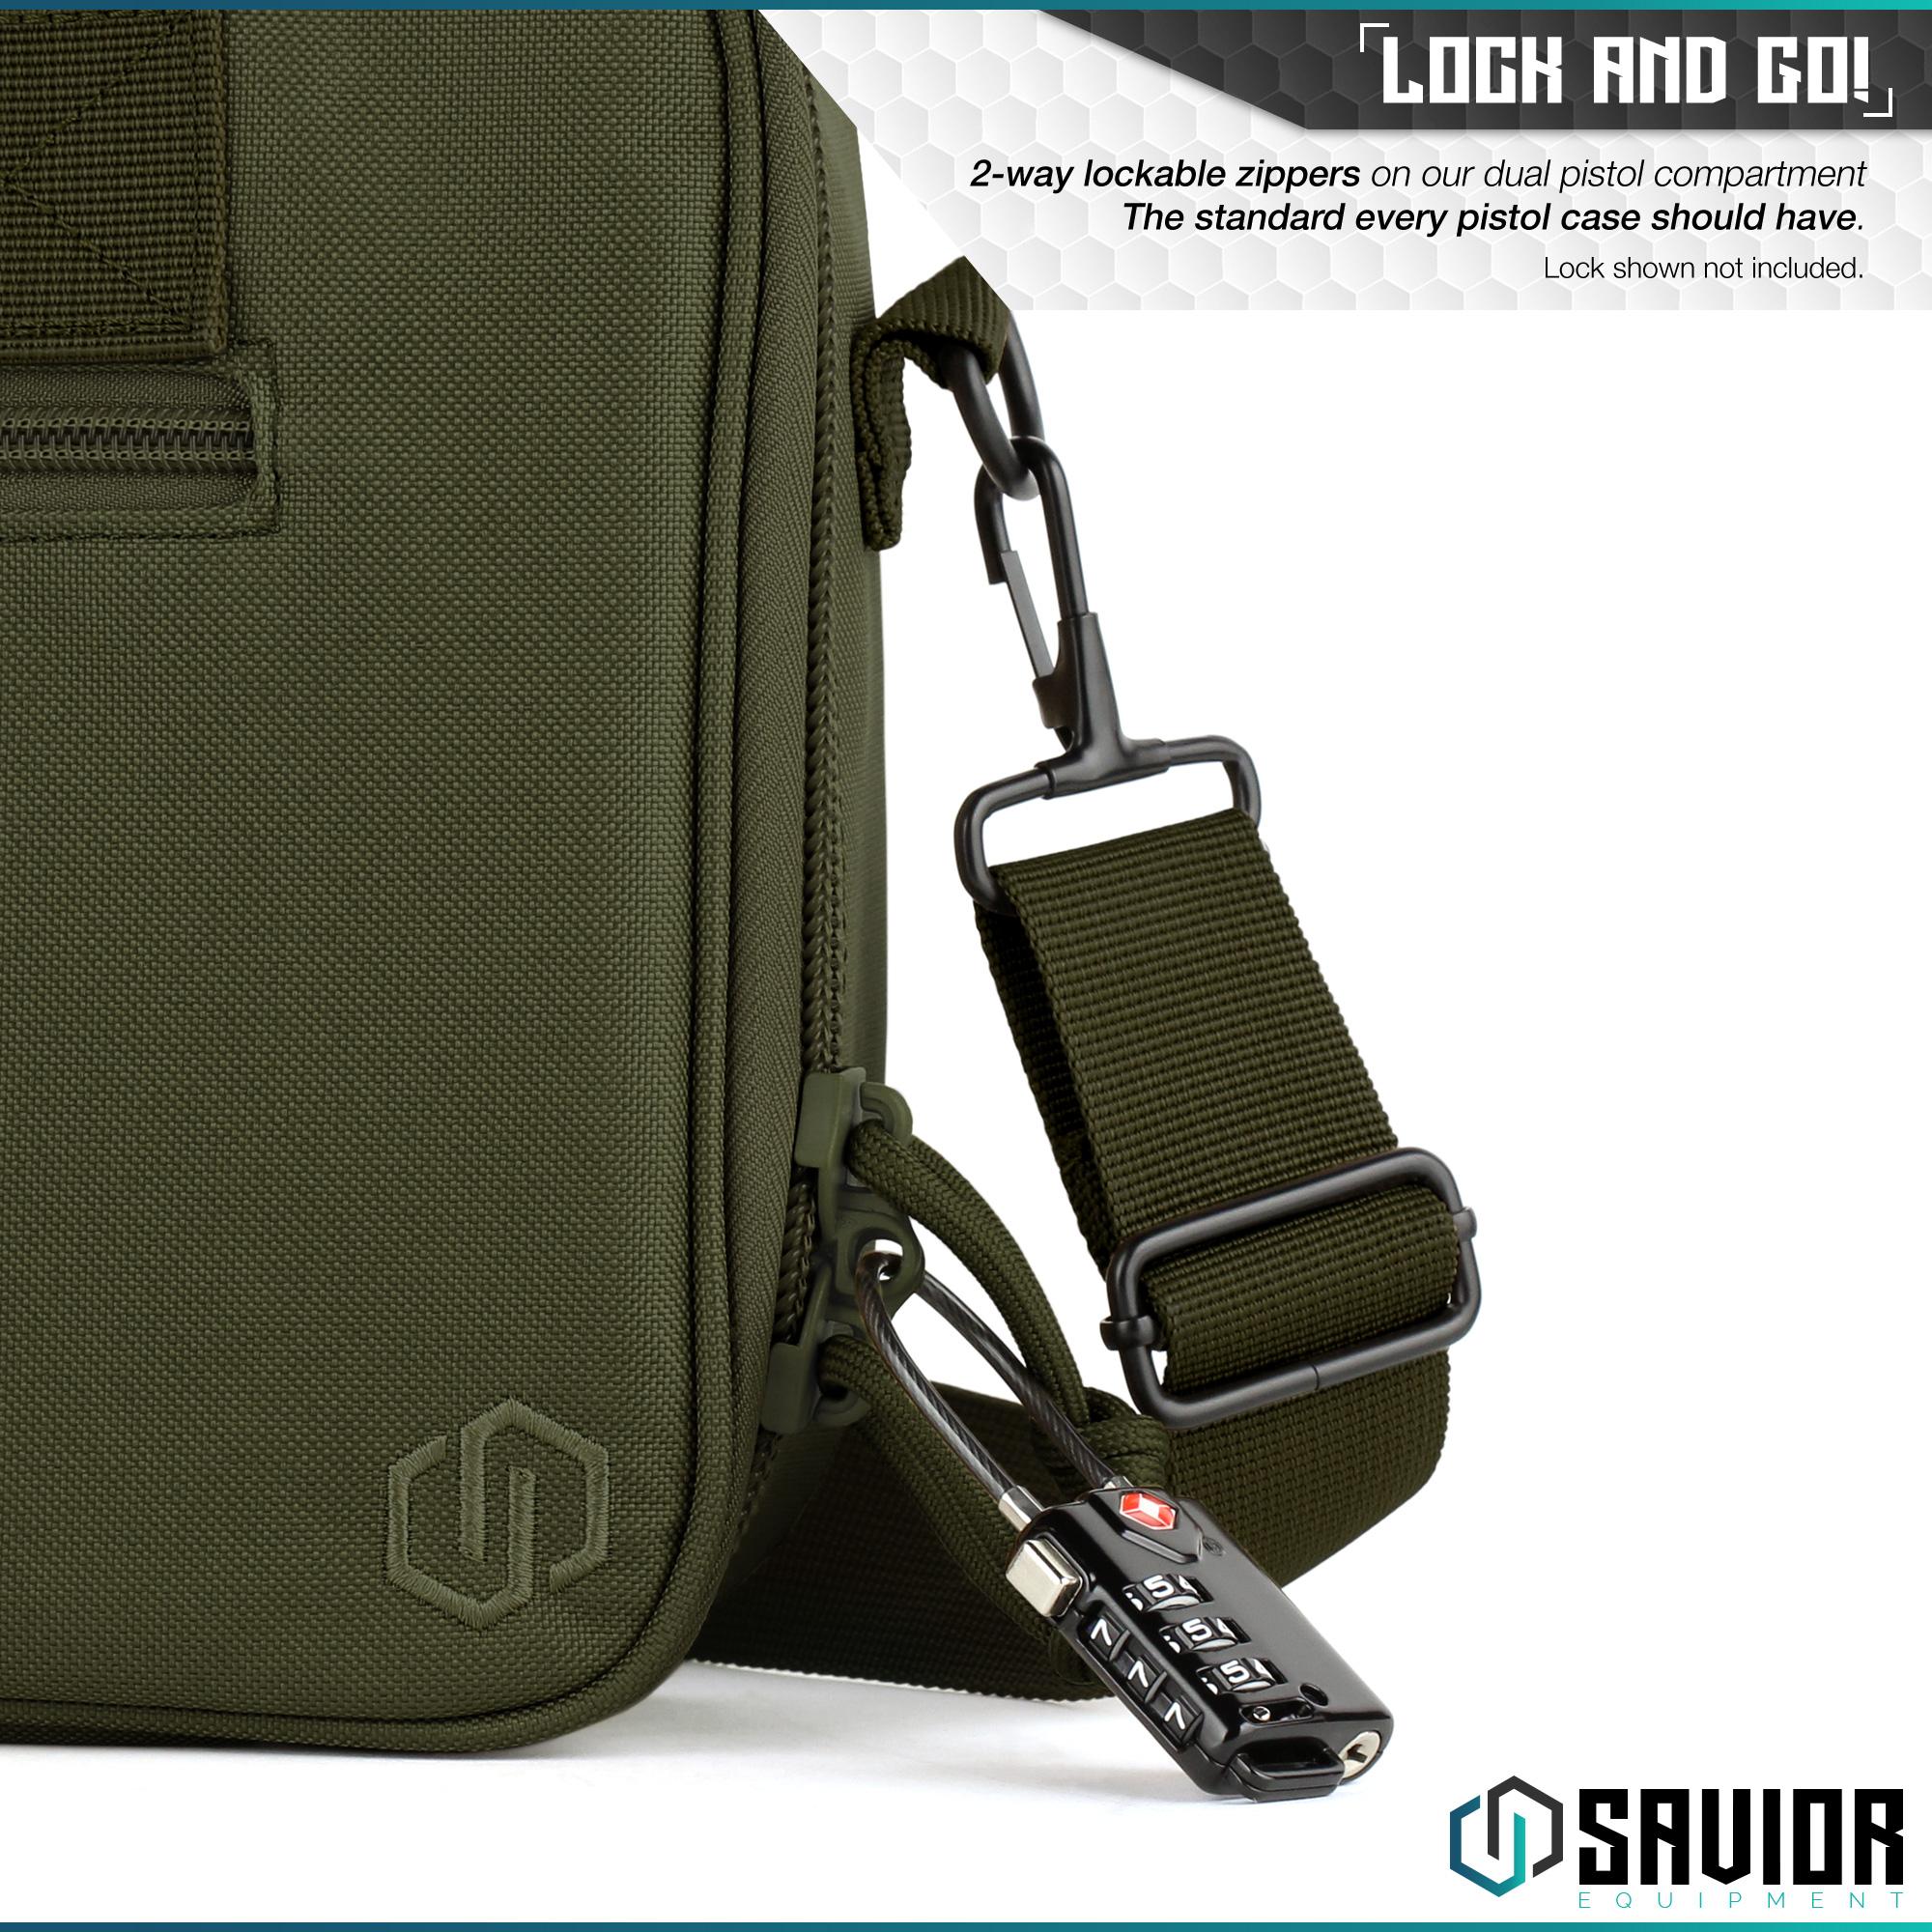 thumbnail 23 - 034-SAVIOR-034-Padded-Discreet-Double-Handgun-Bag-Pistol-Storage-Case-w-Mag-Pouch-Slot